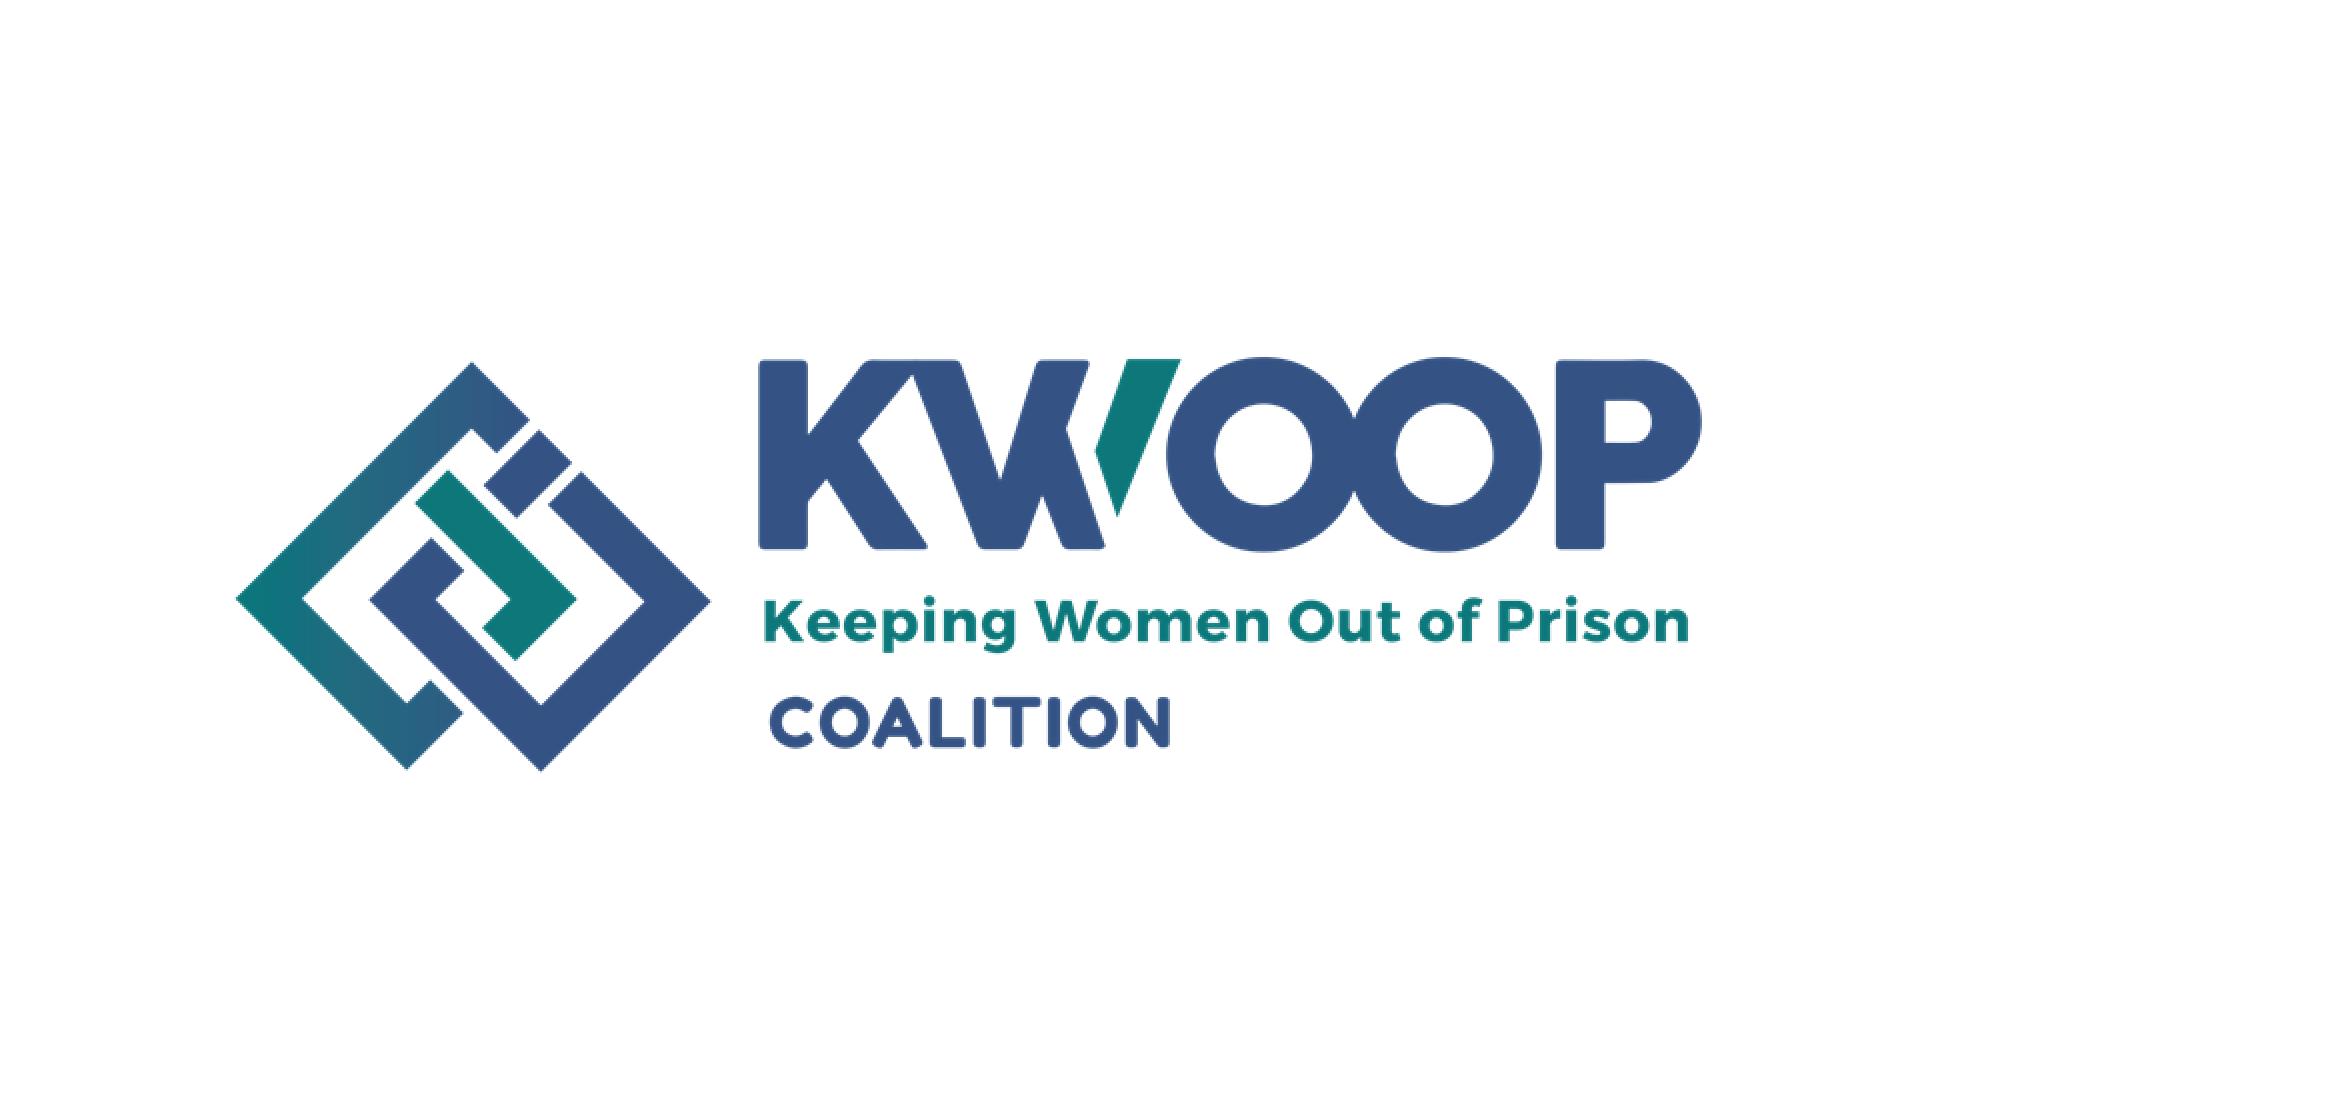 Profile women in prison NSW